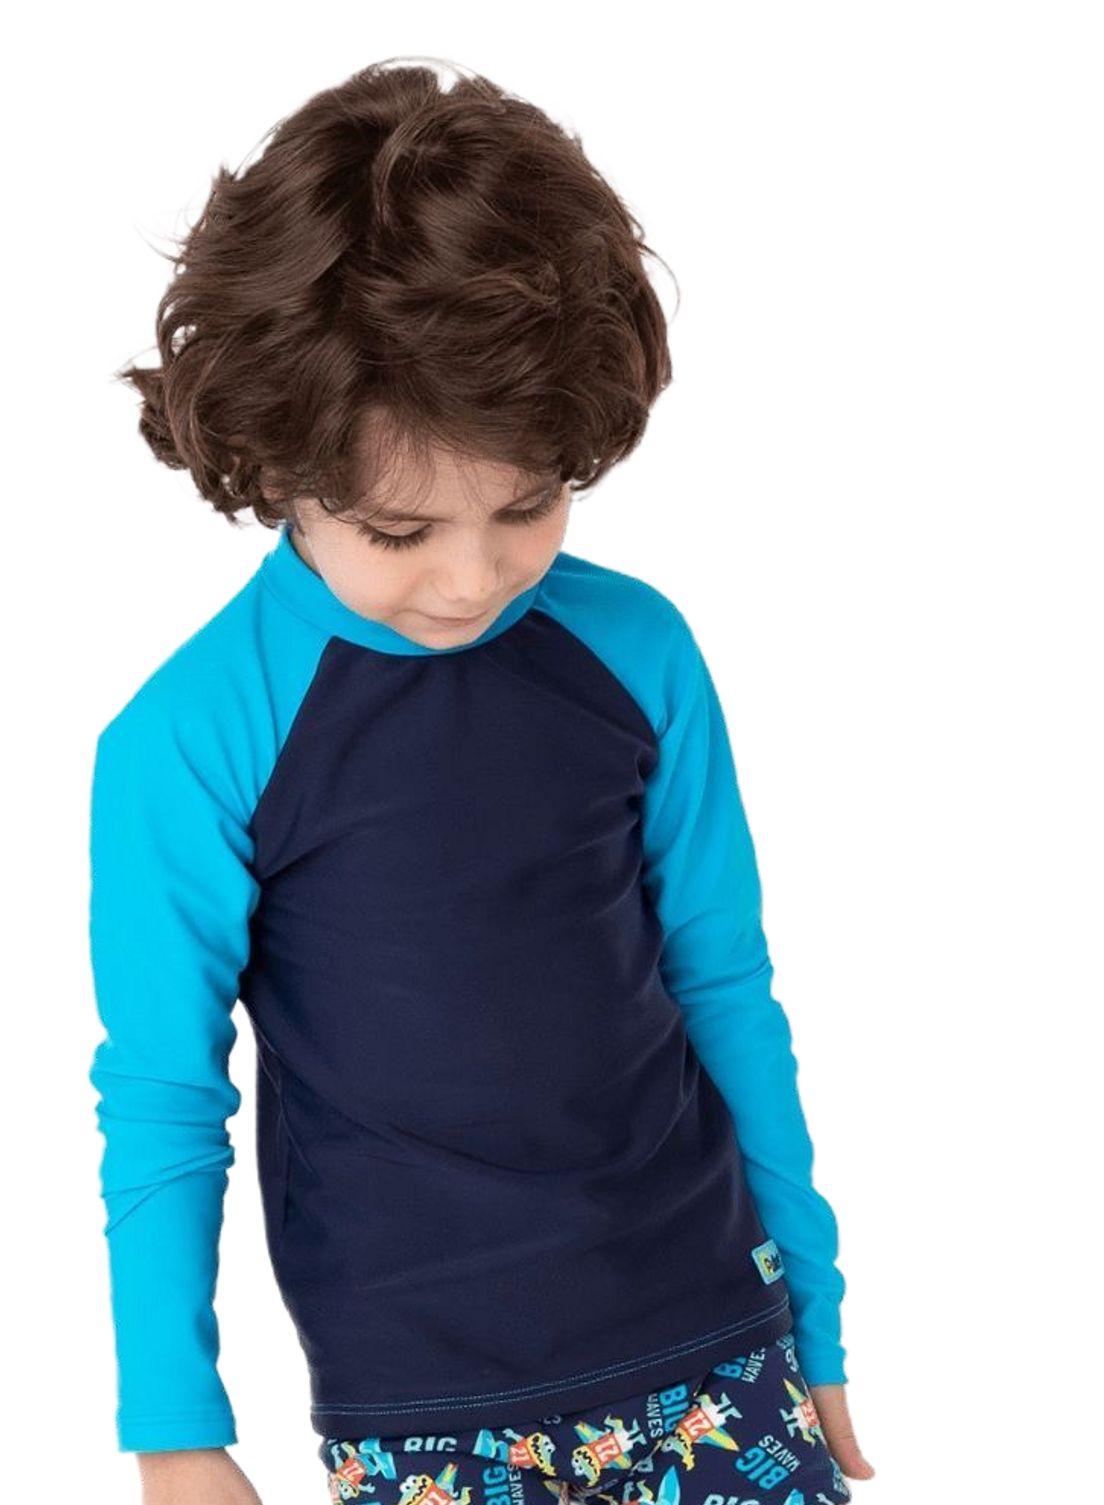 Camiseta Praia Infantil Puket  Marinho e Azul